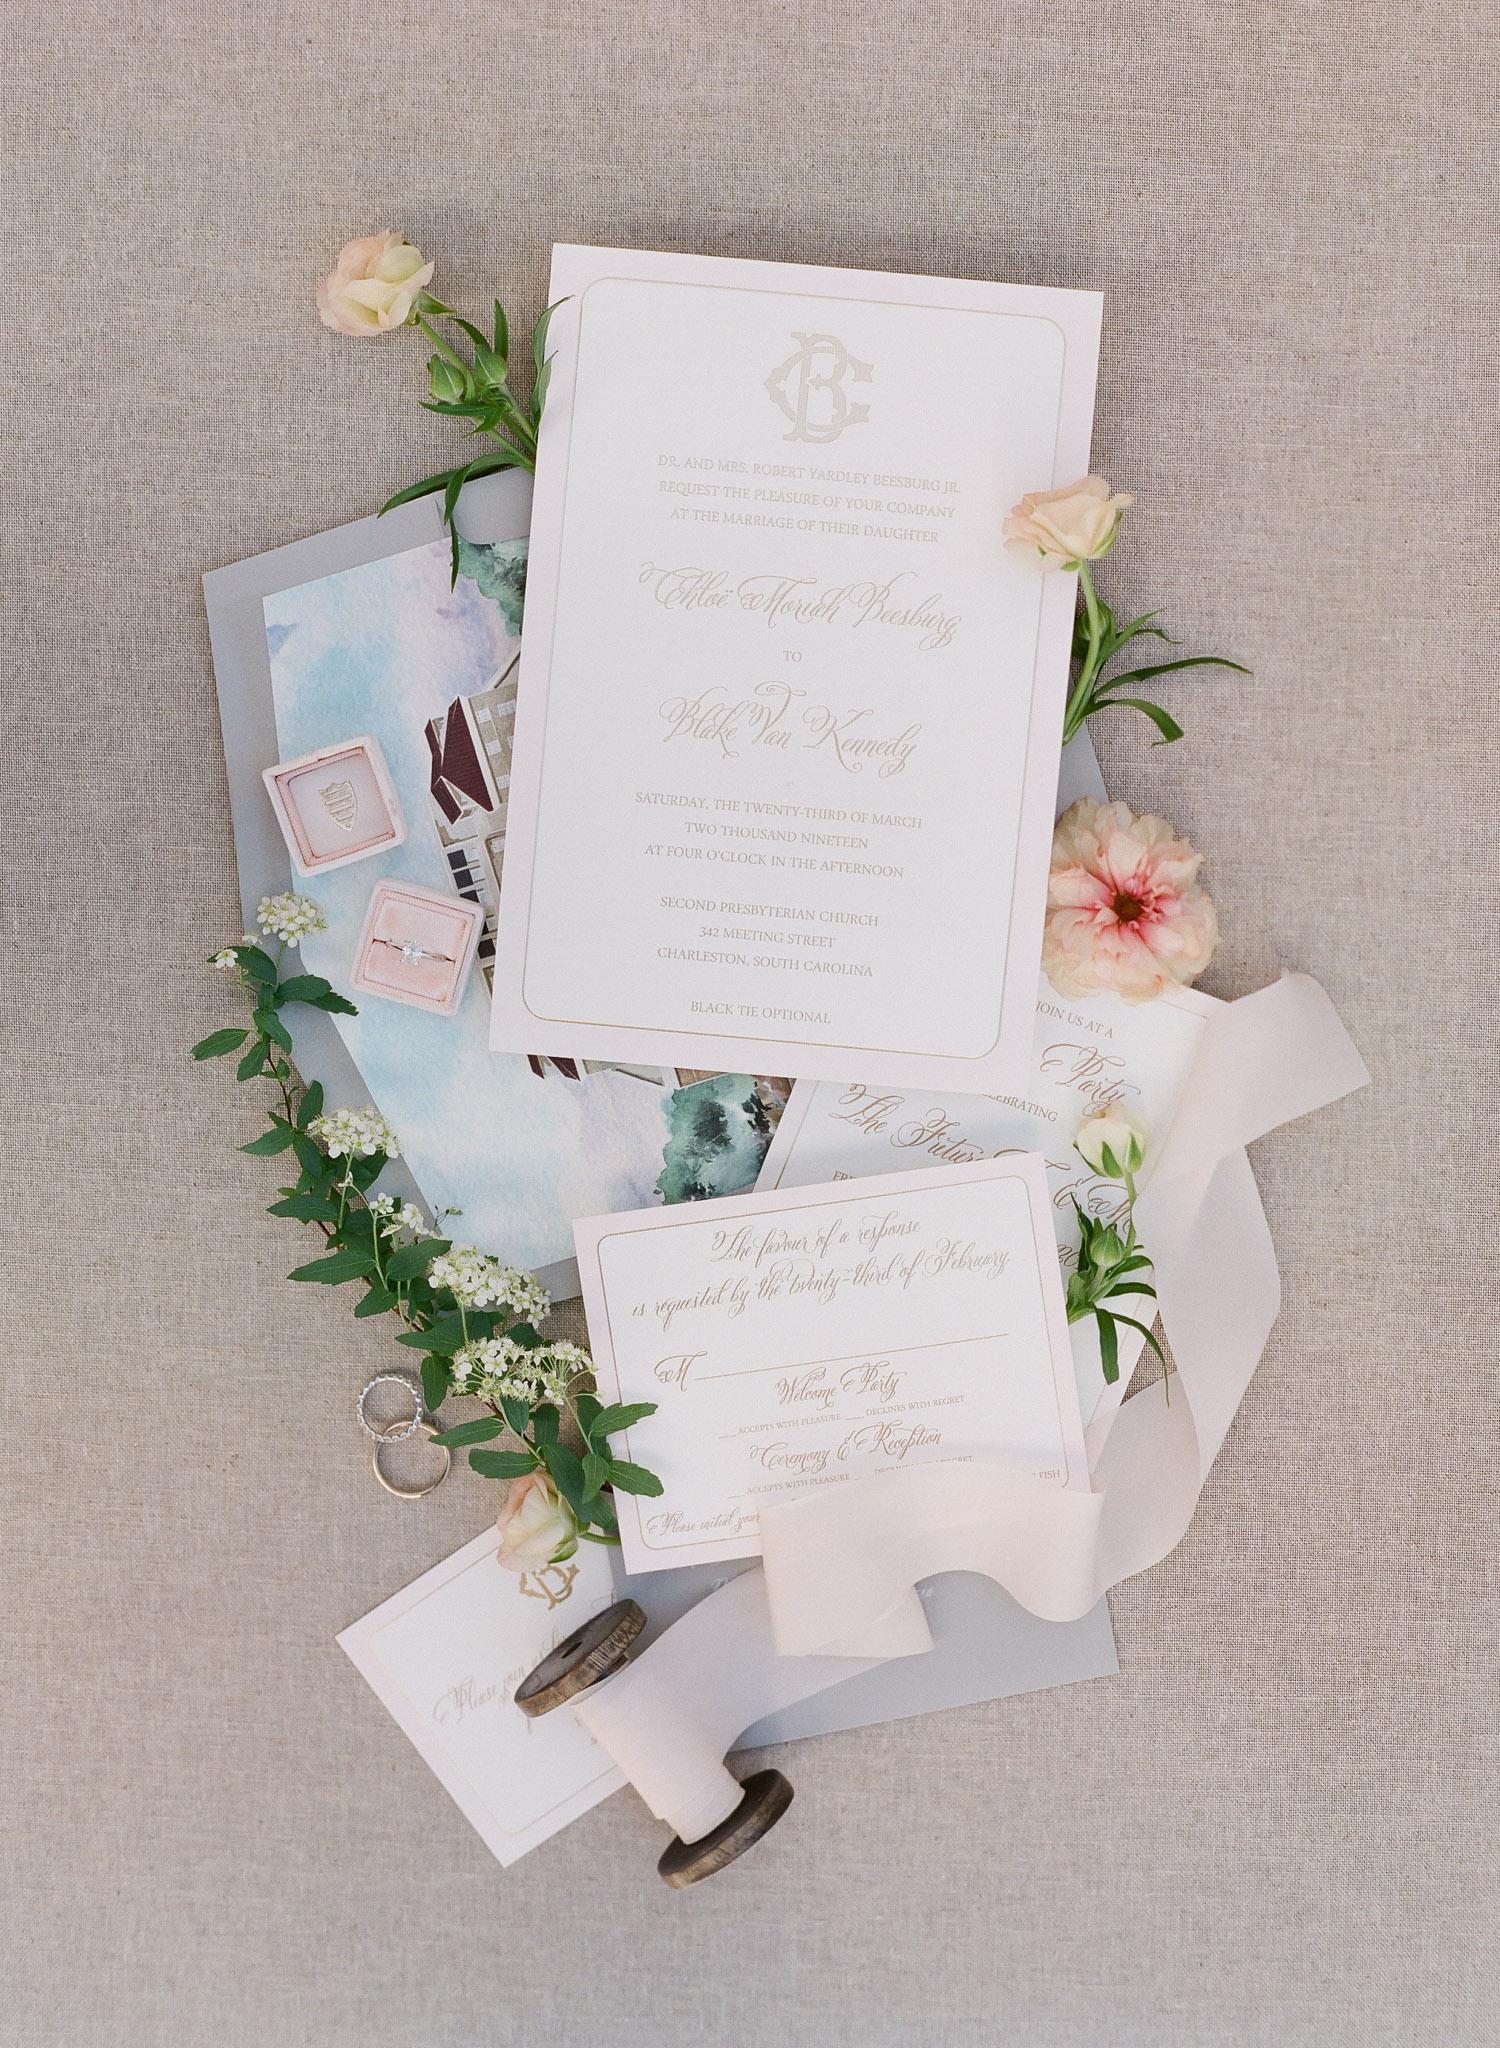 Charleston-Wedding-Photographers-Hotel-Bennett-2.jpg